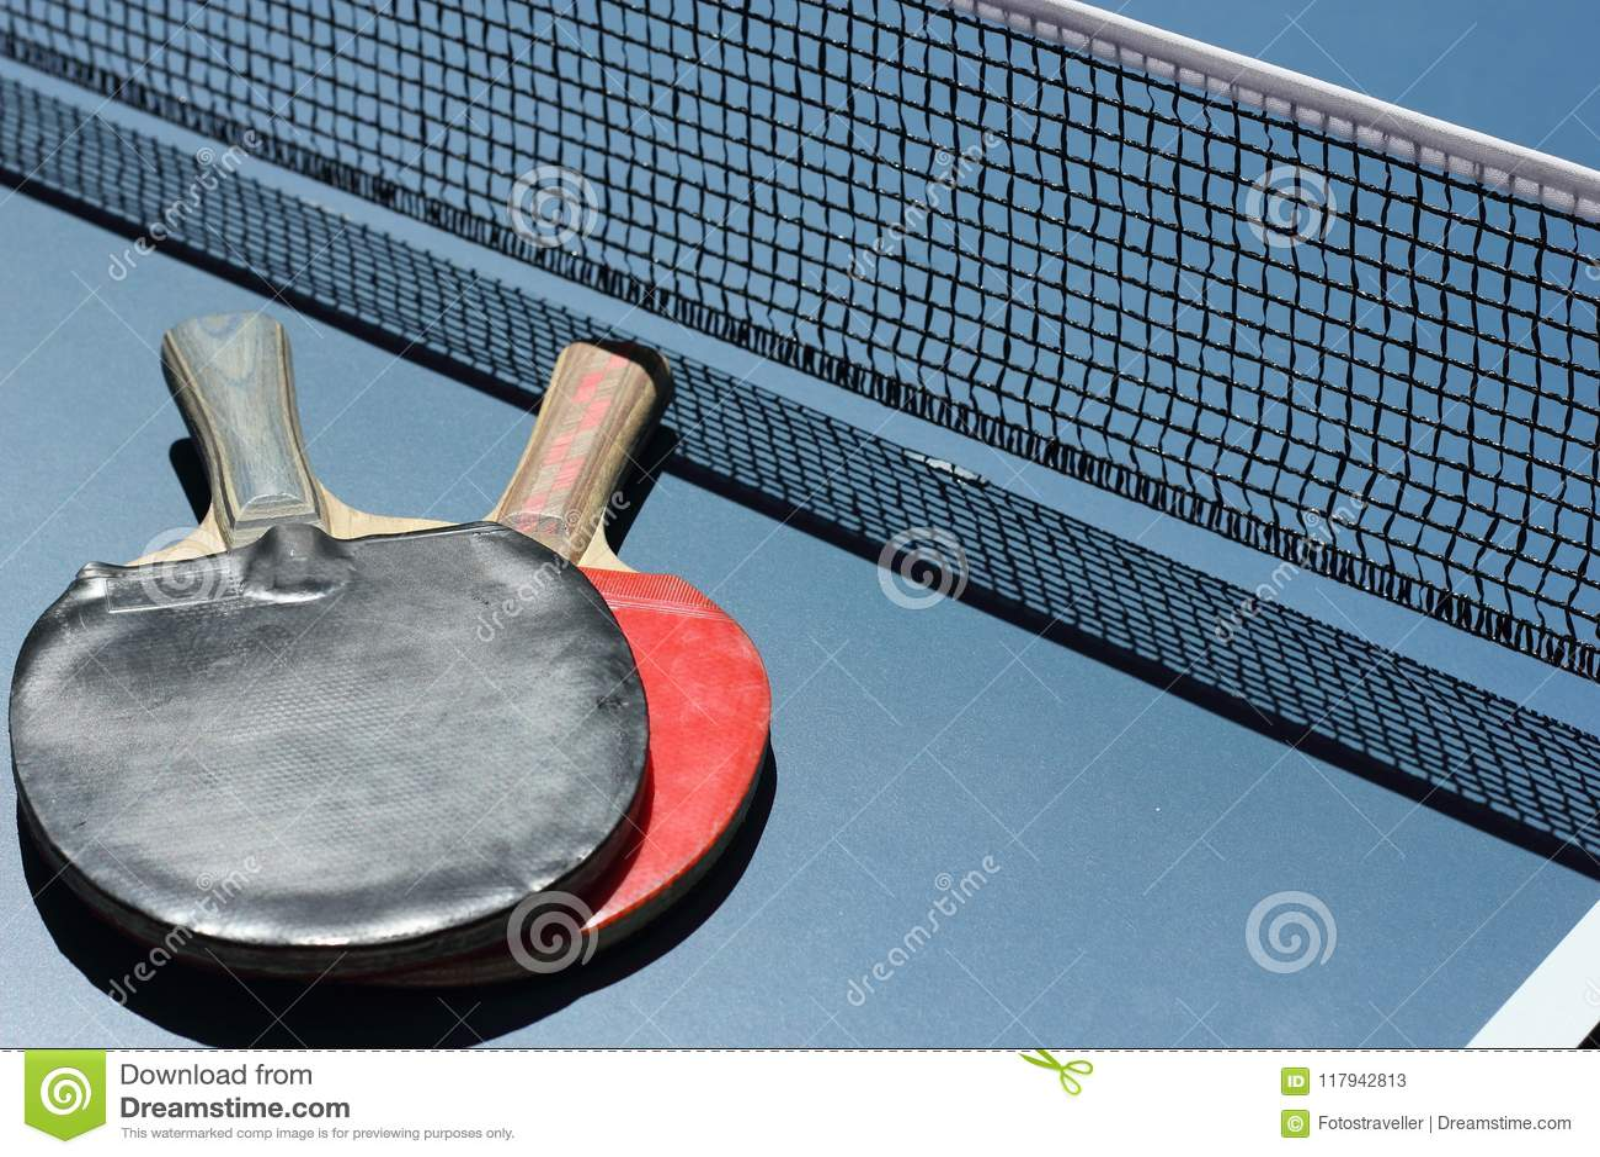 Geometry in sports. Geometric figures in table tennis